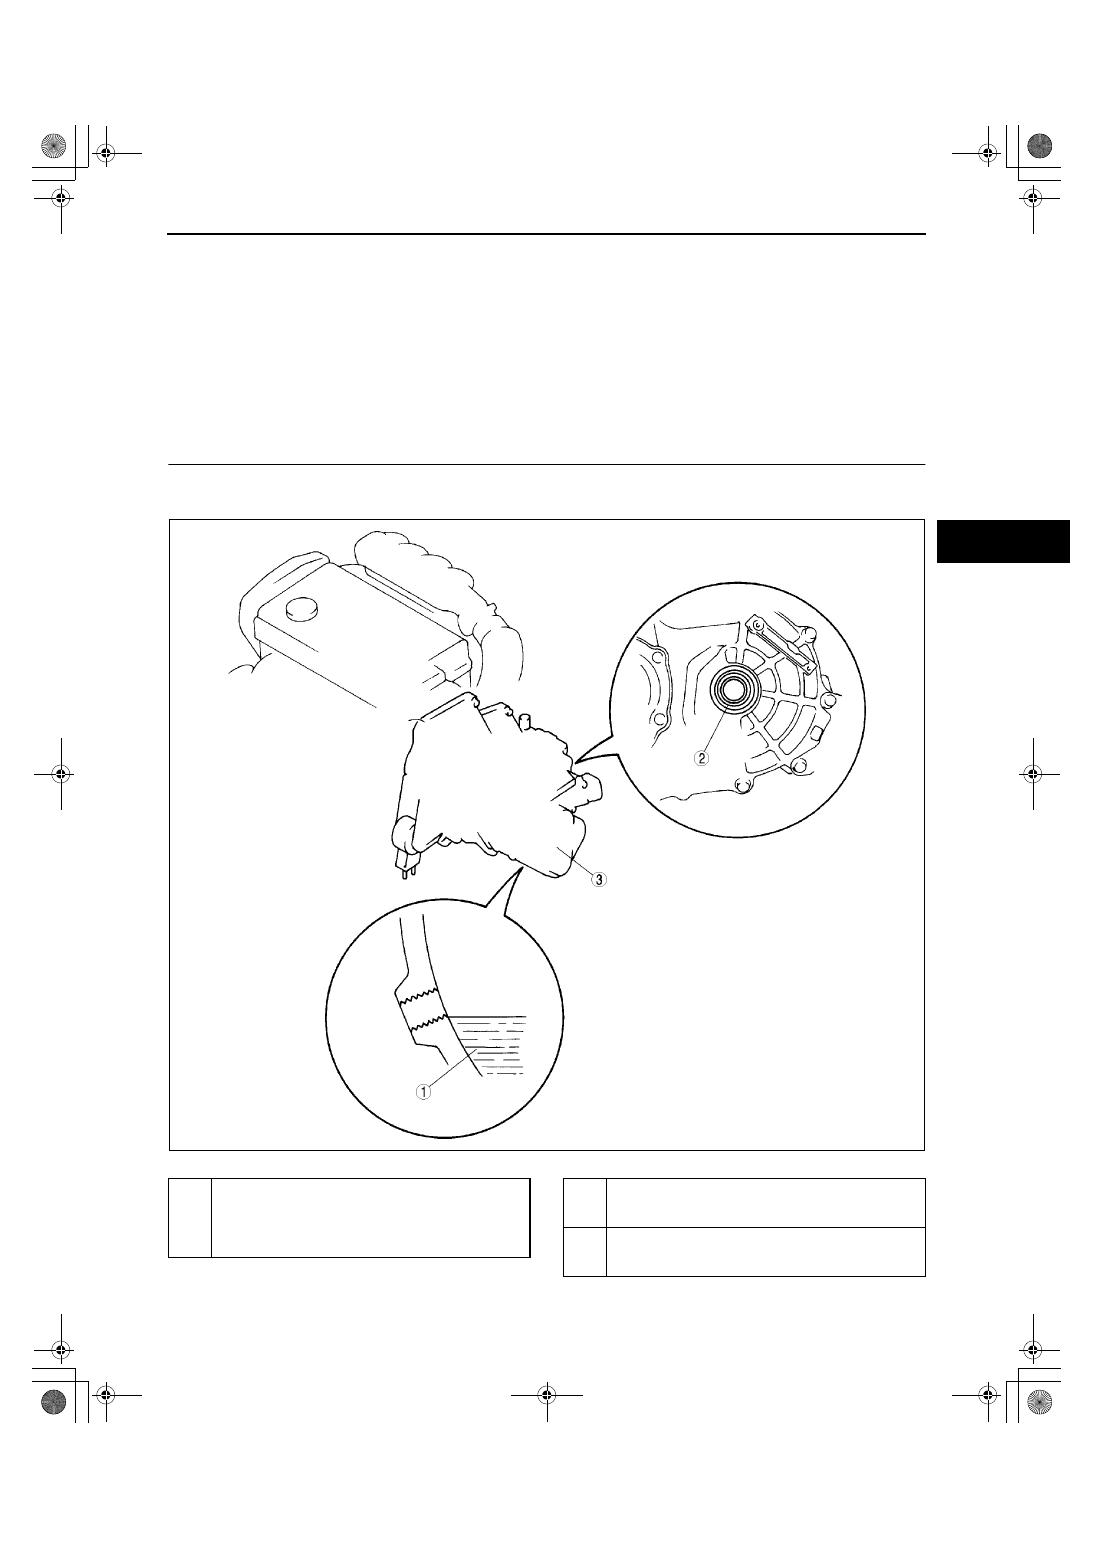 mazda protege 5 manual part 246 rh zinref ru Transaxle Assembly FWD Transaxle